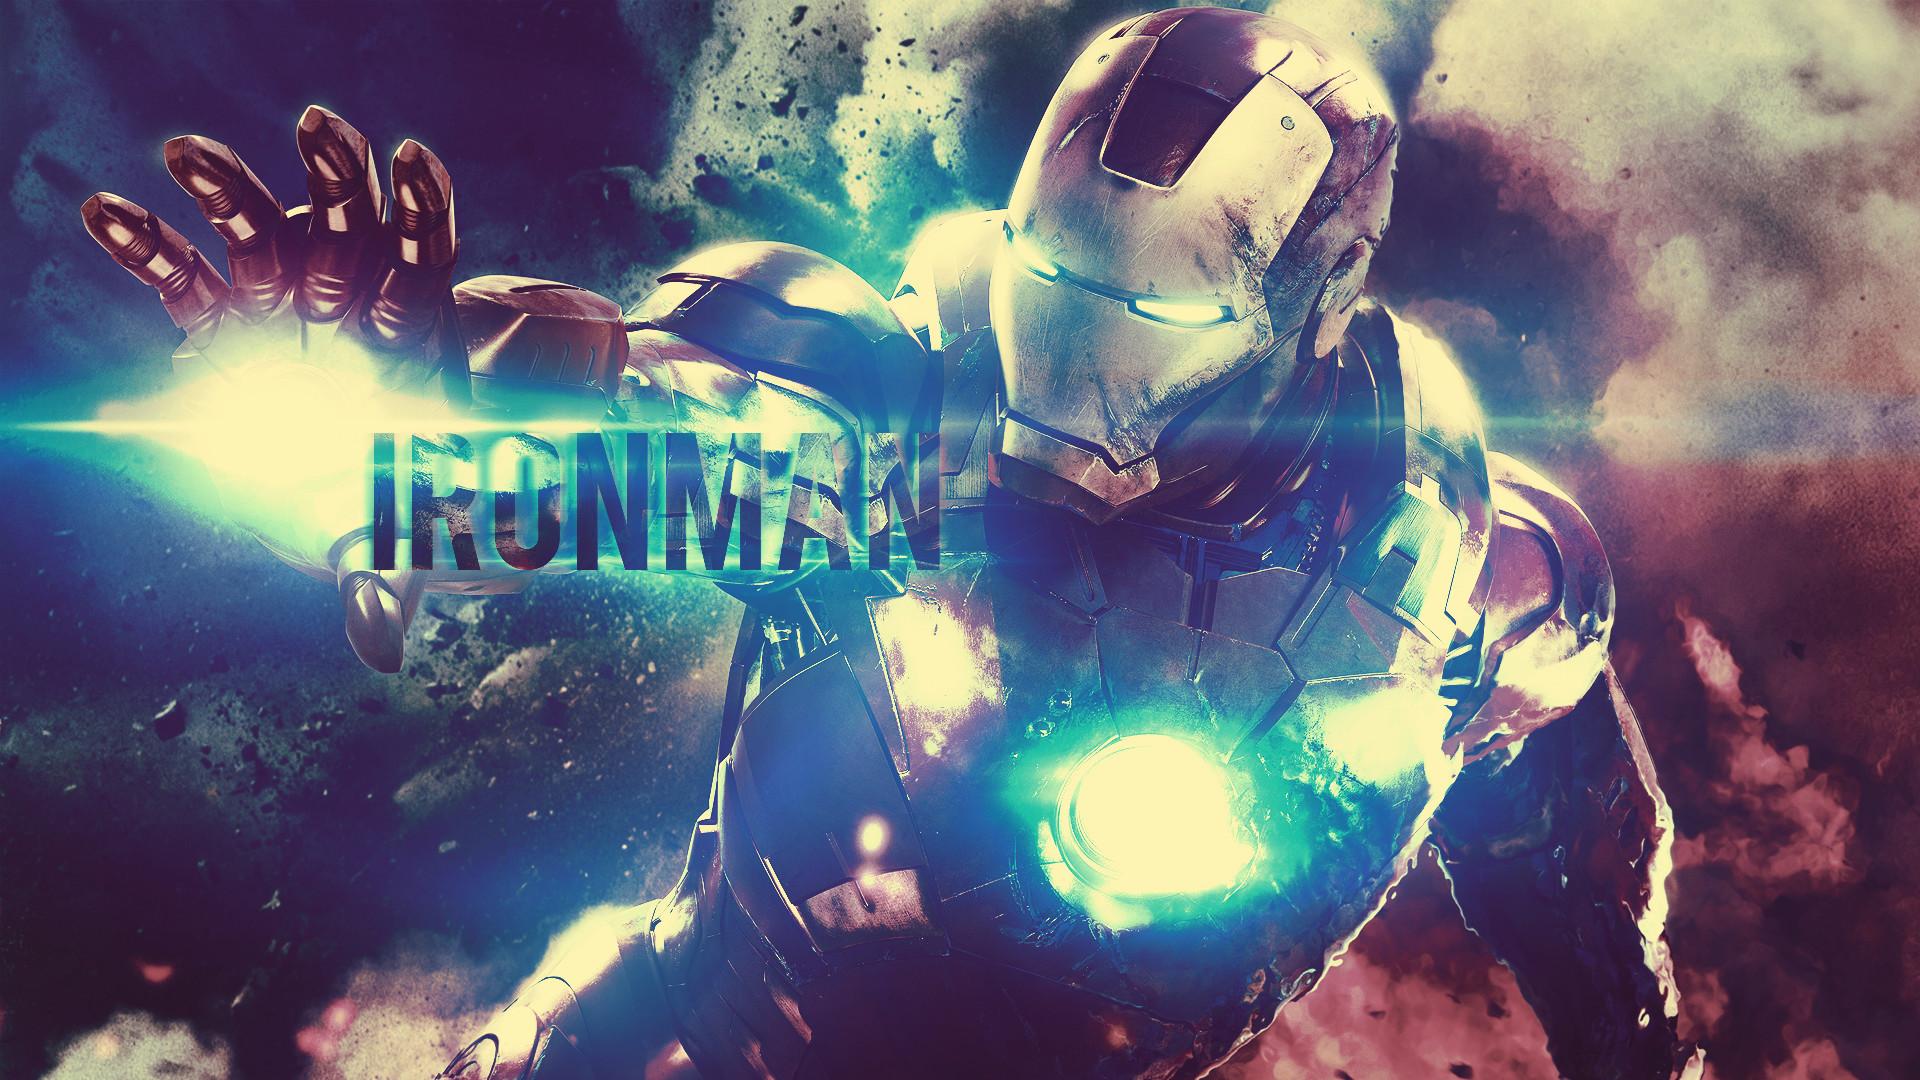 Iron Man Wallpaper 1080P by JoaoRoberto2294 Iron Man Wallpaper 1080P by  JoaoRoberto2294